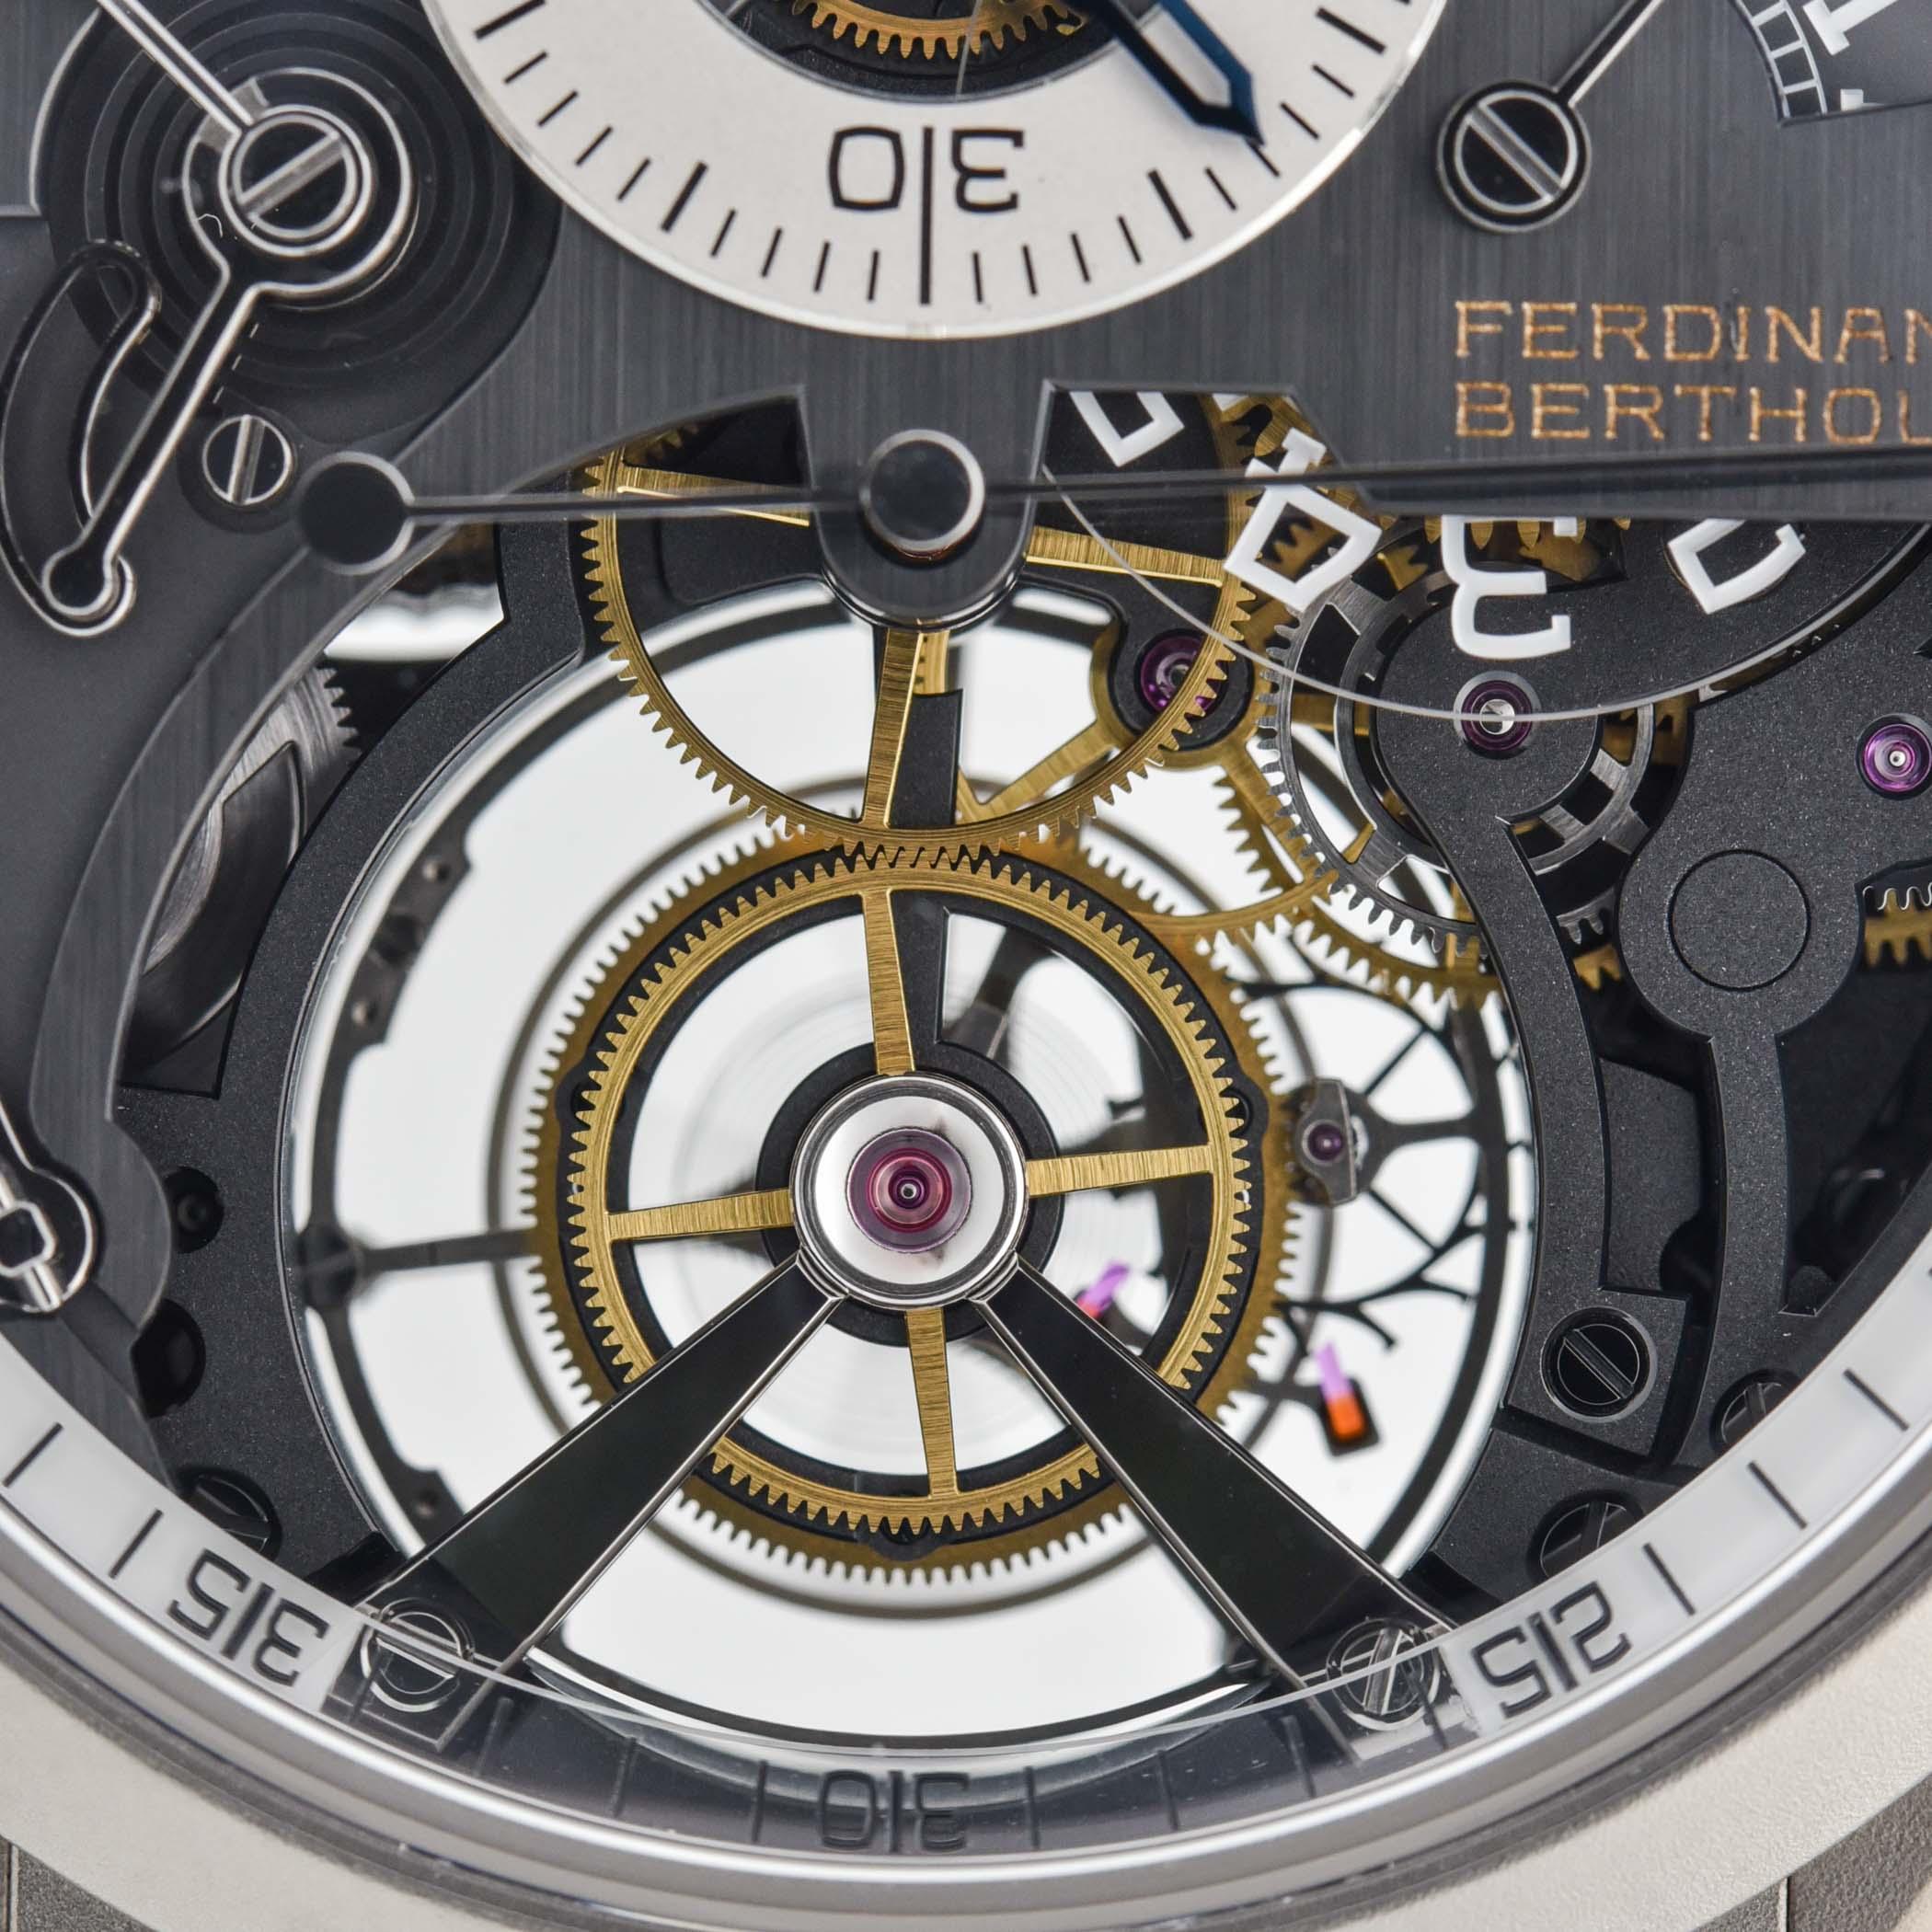 Ferdinand Berthoud Régulateur FB RS openworked - hands-on - 8